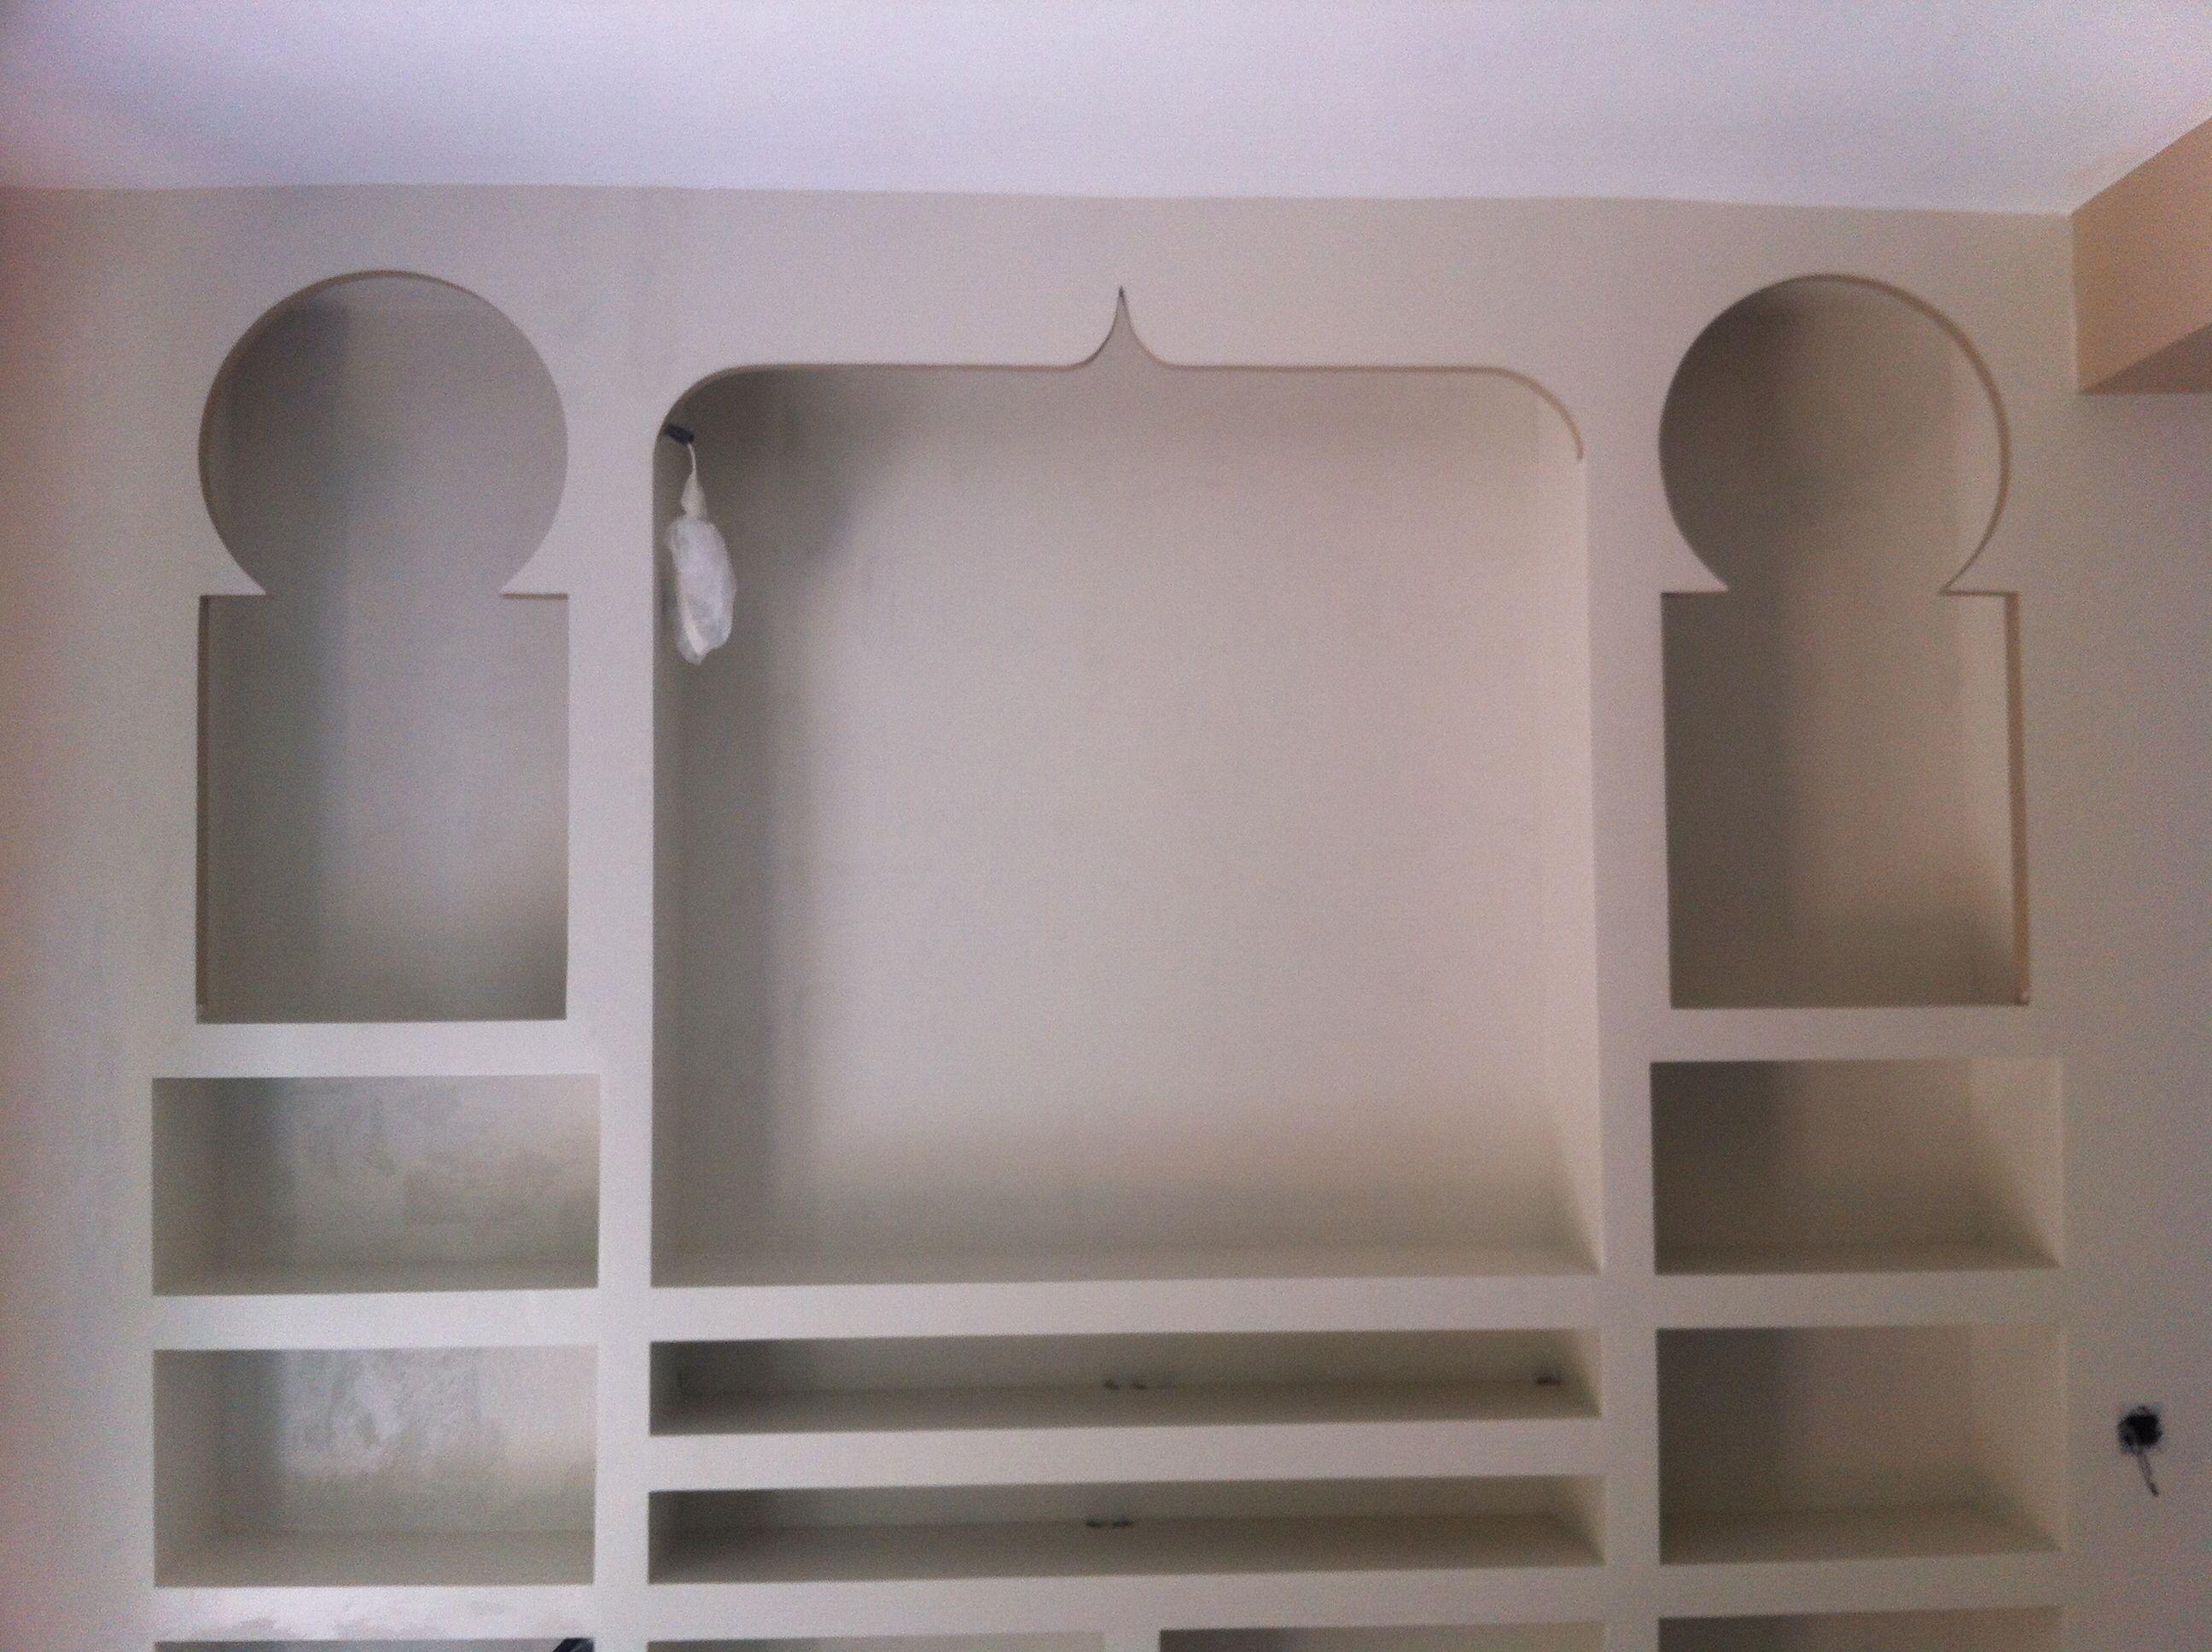 Mueble rabe de sal n de pladur muebles de lujos for Hacer mueble salon moderno